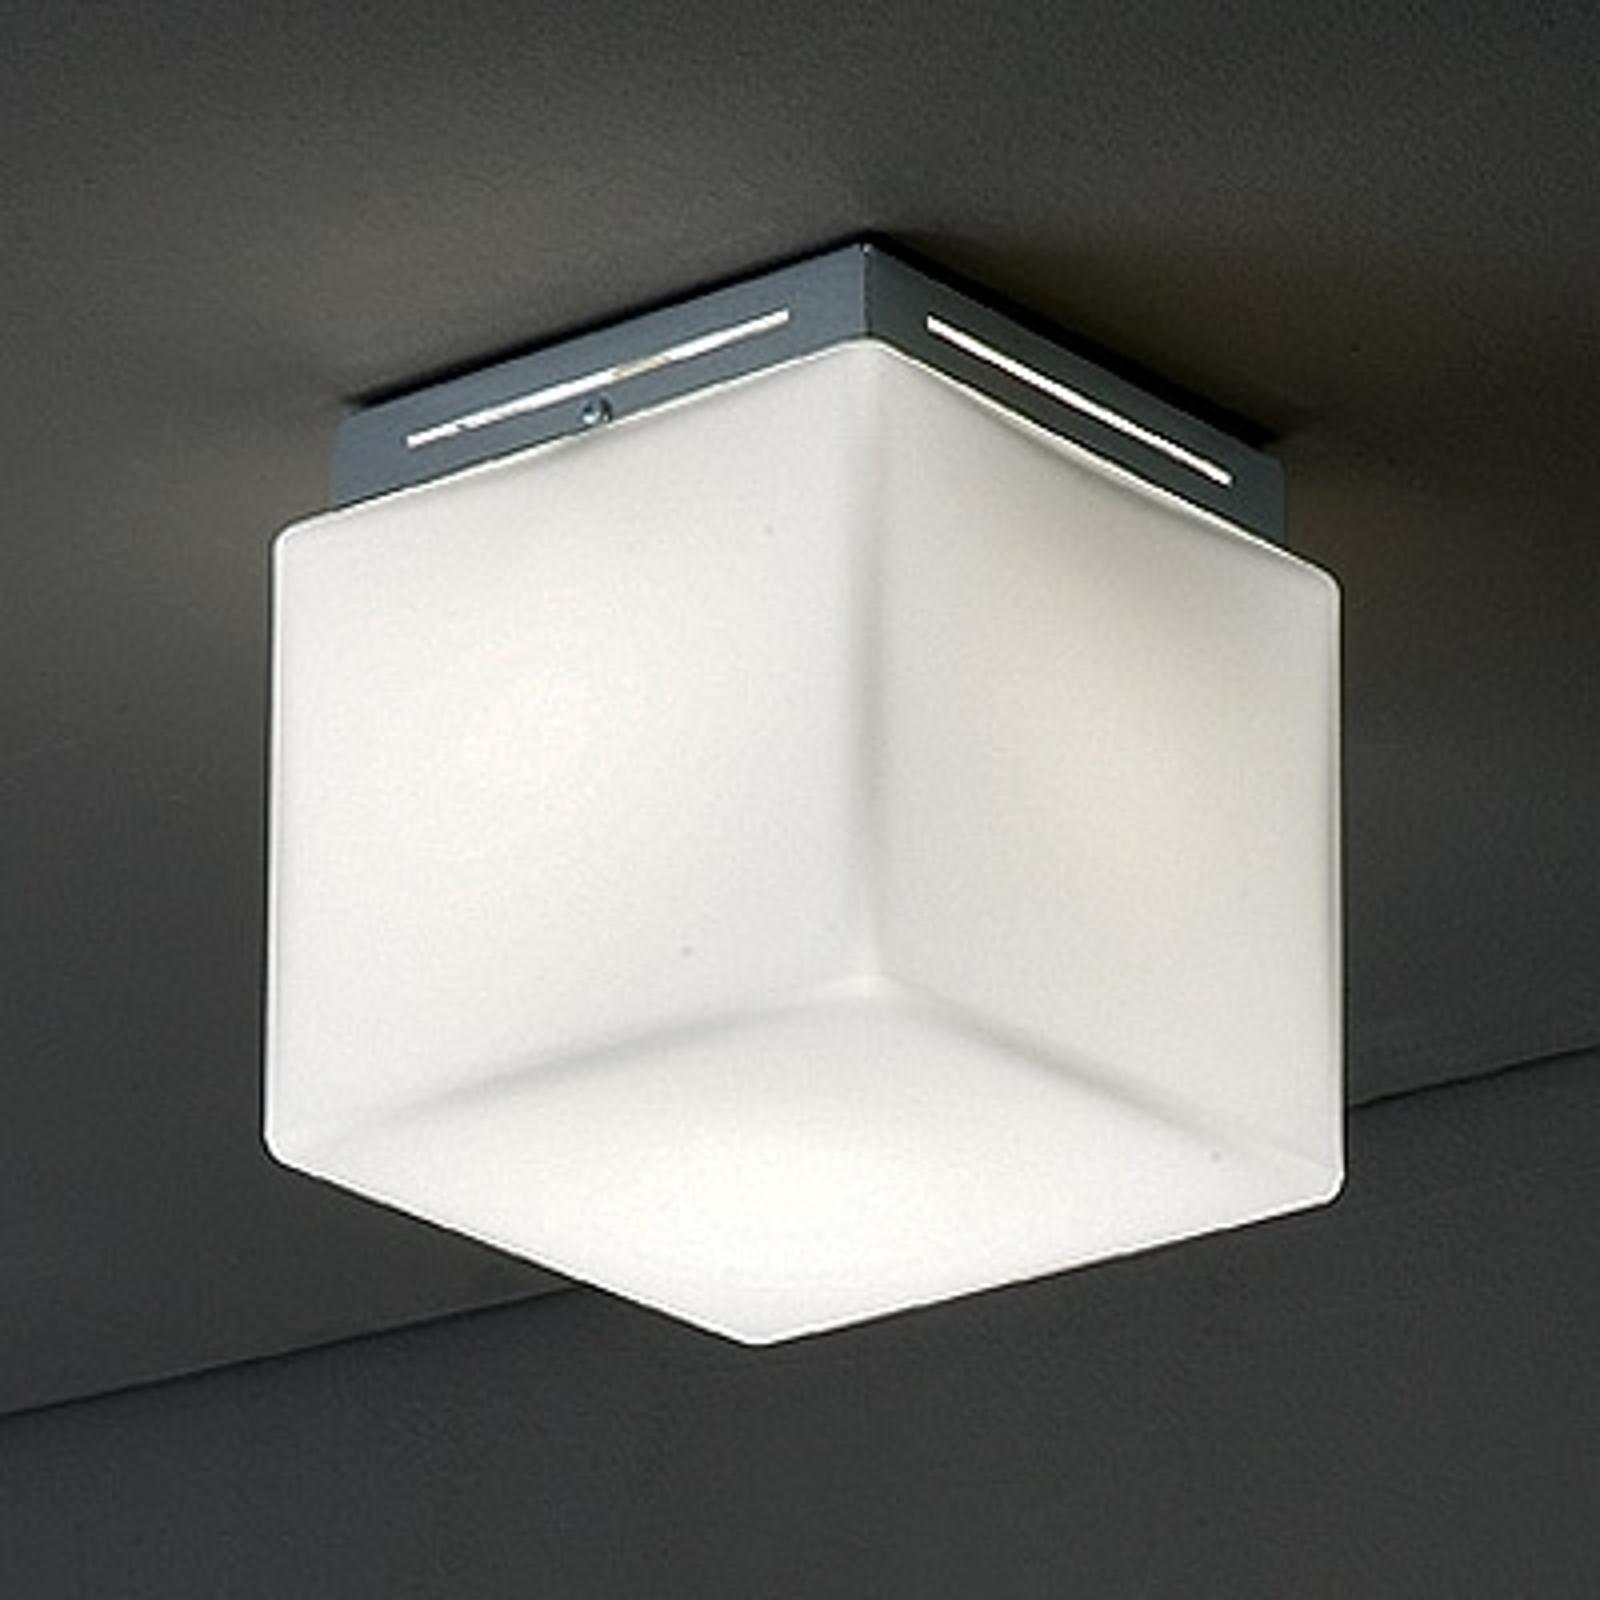 Ceiling light Cubis_1053012_1